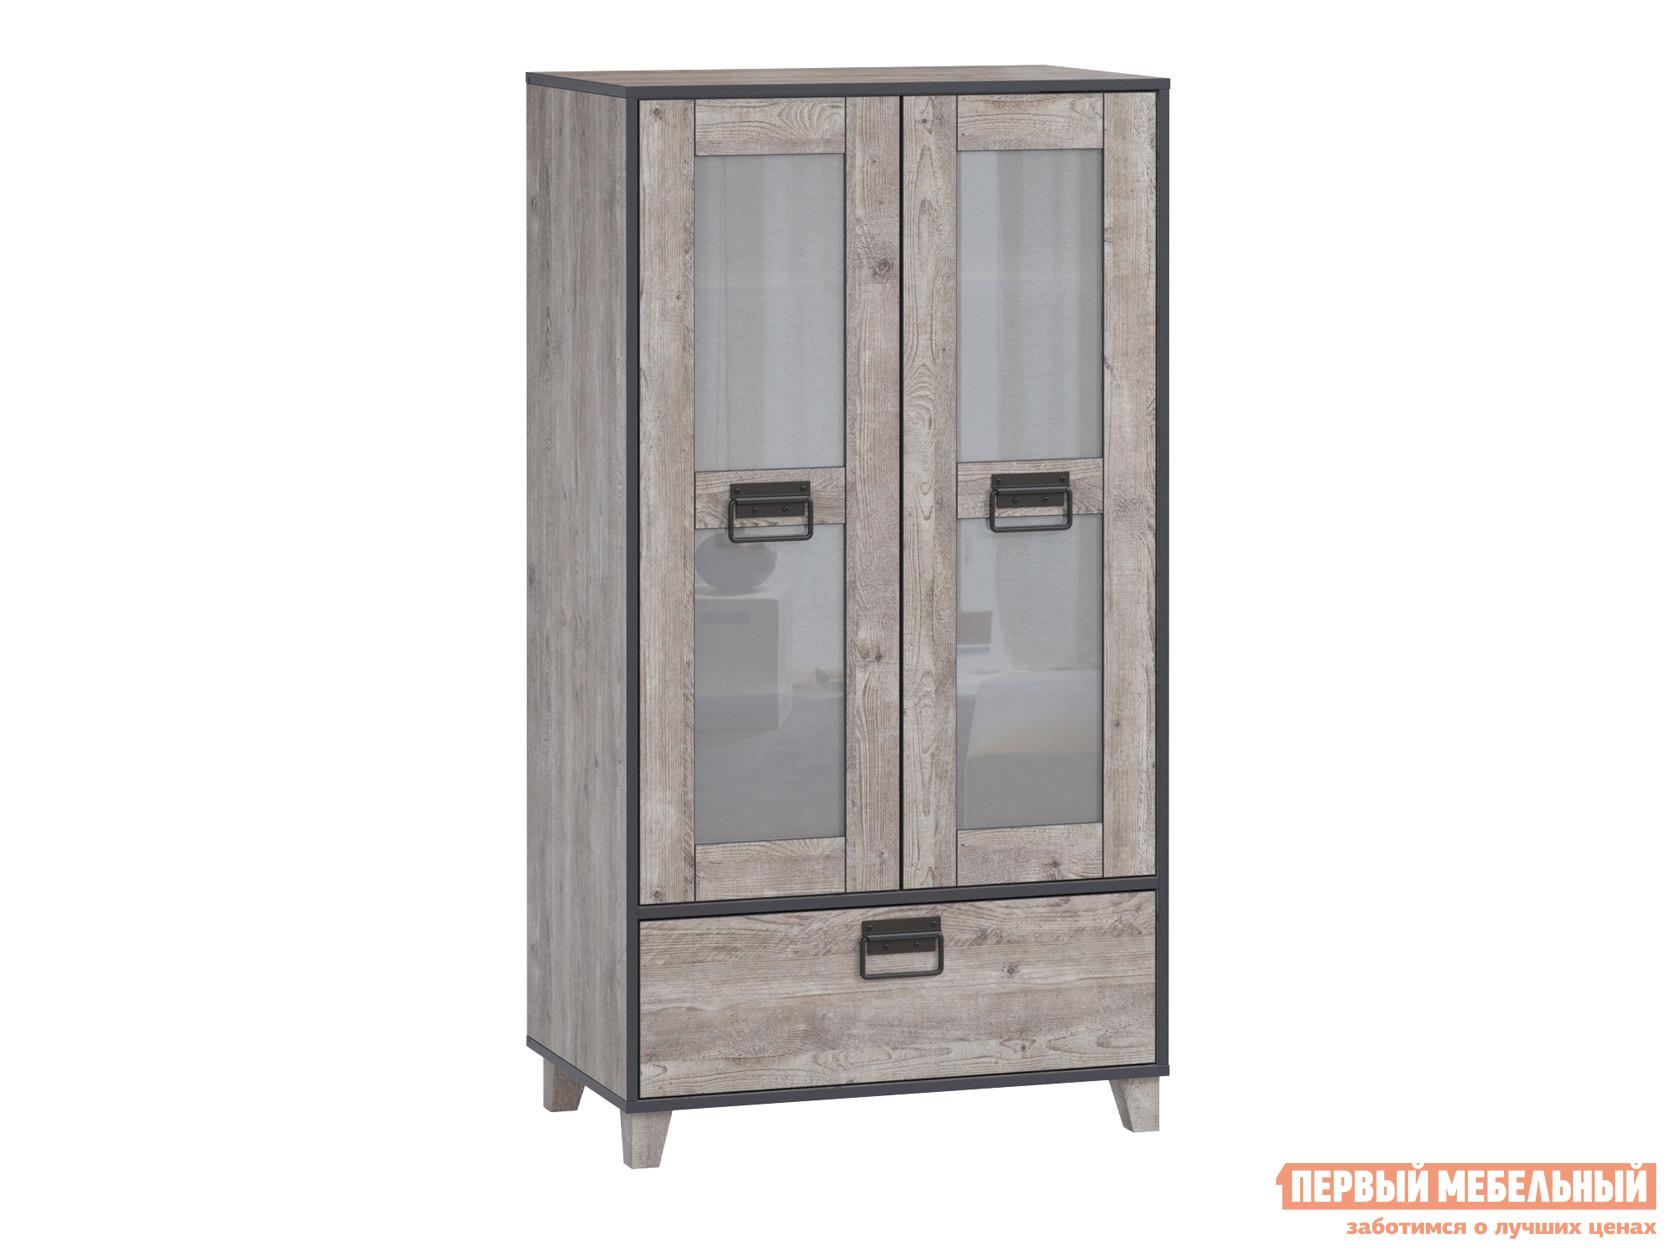 Шкаф-витрина WOODCRAFT Эссен Шкаф-витрина стенка витрина луиза 1600